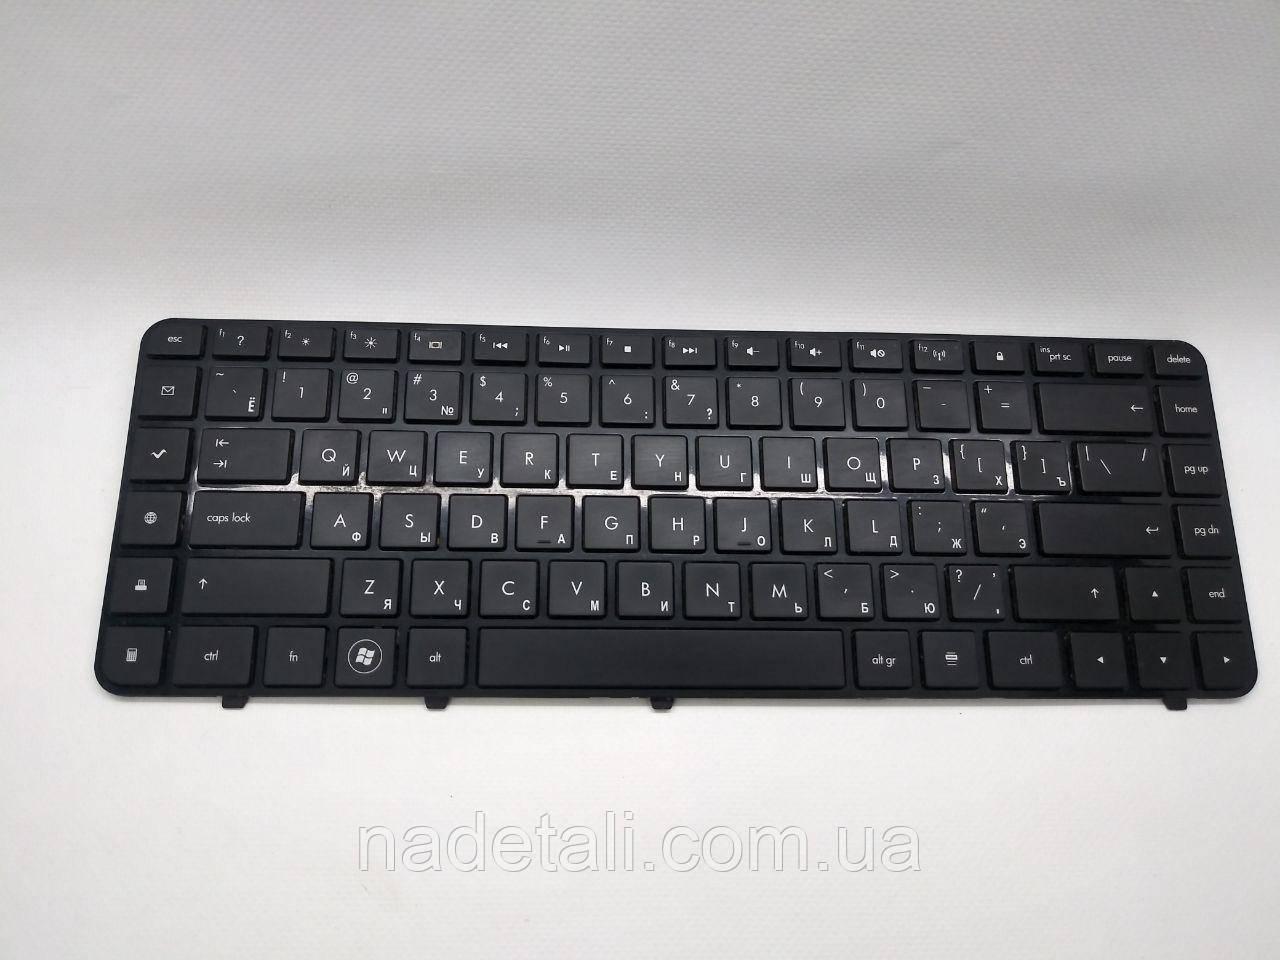 Клавиатура HP Pavilion dv6-3000 AELX8700310 606746-251